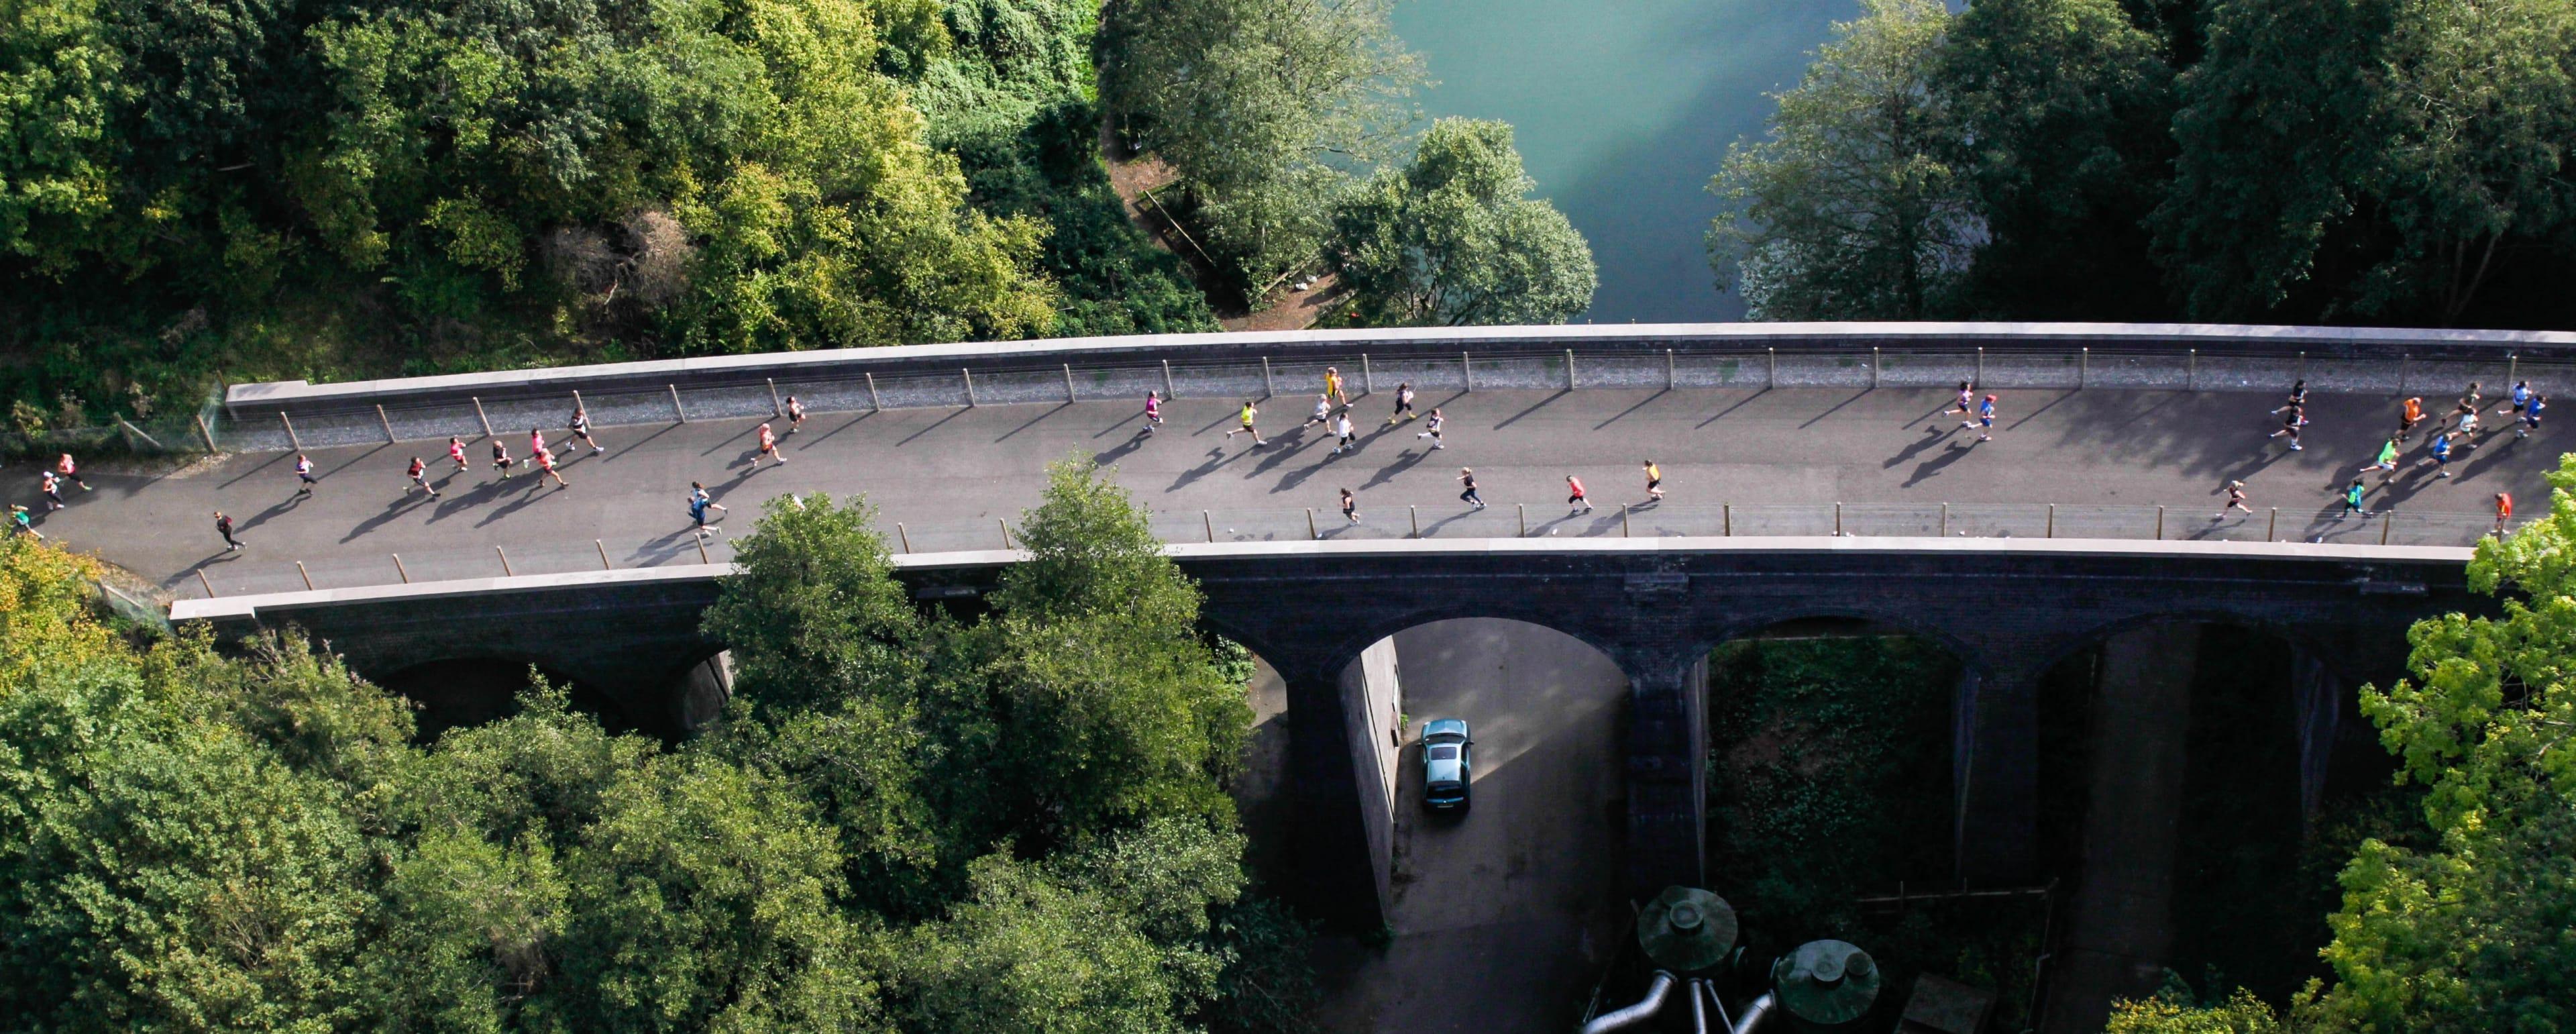 Bath Two Tunnels Railway Running Races - October